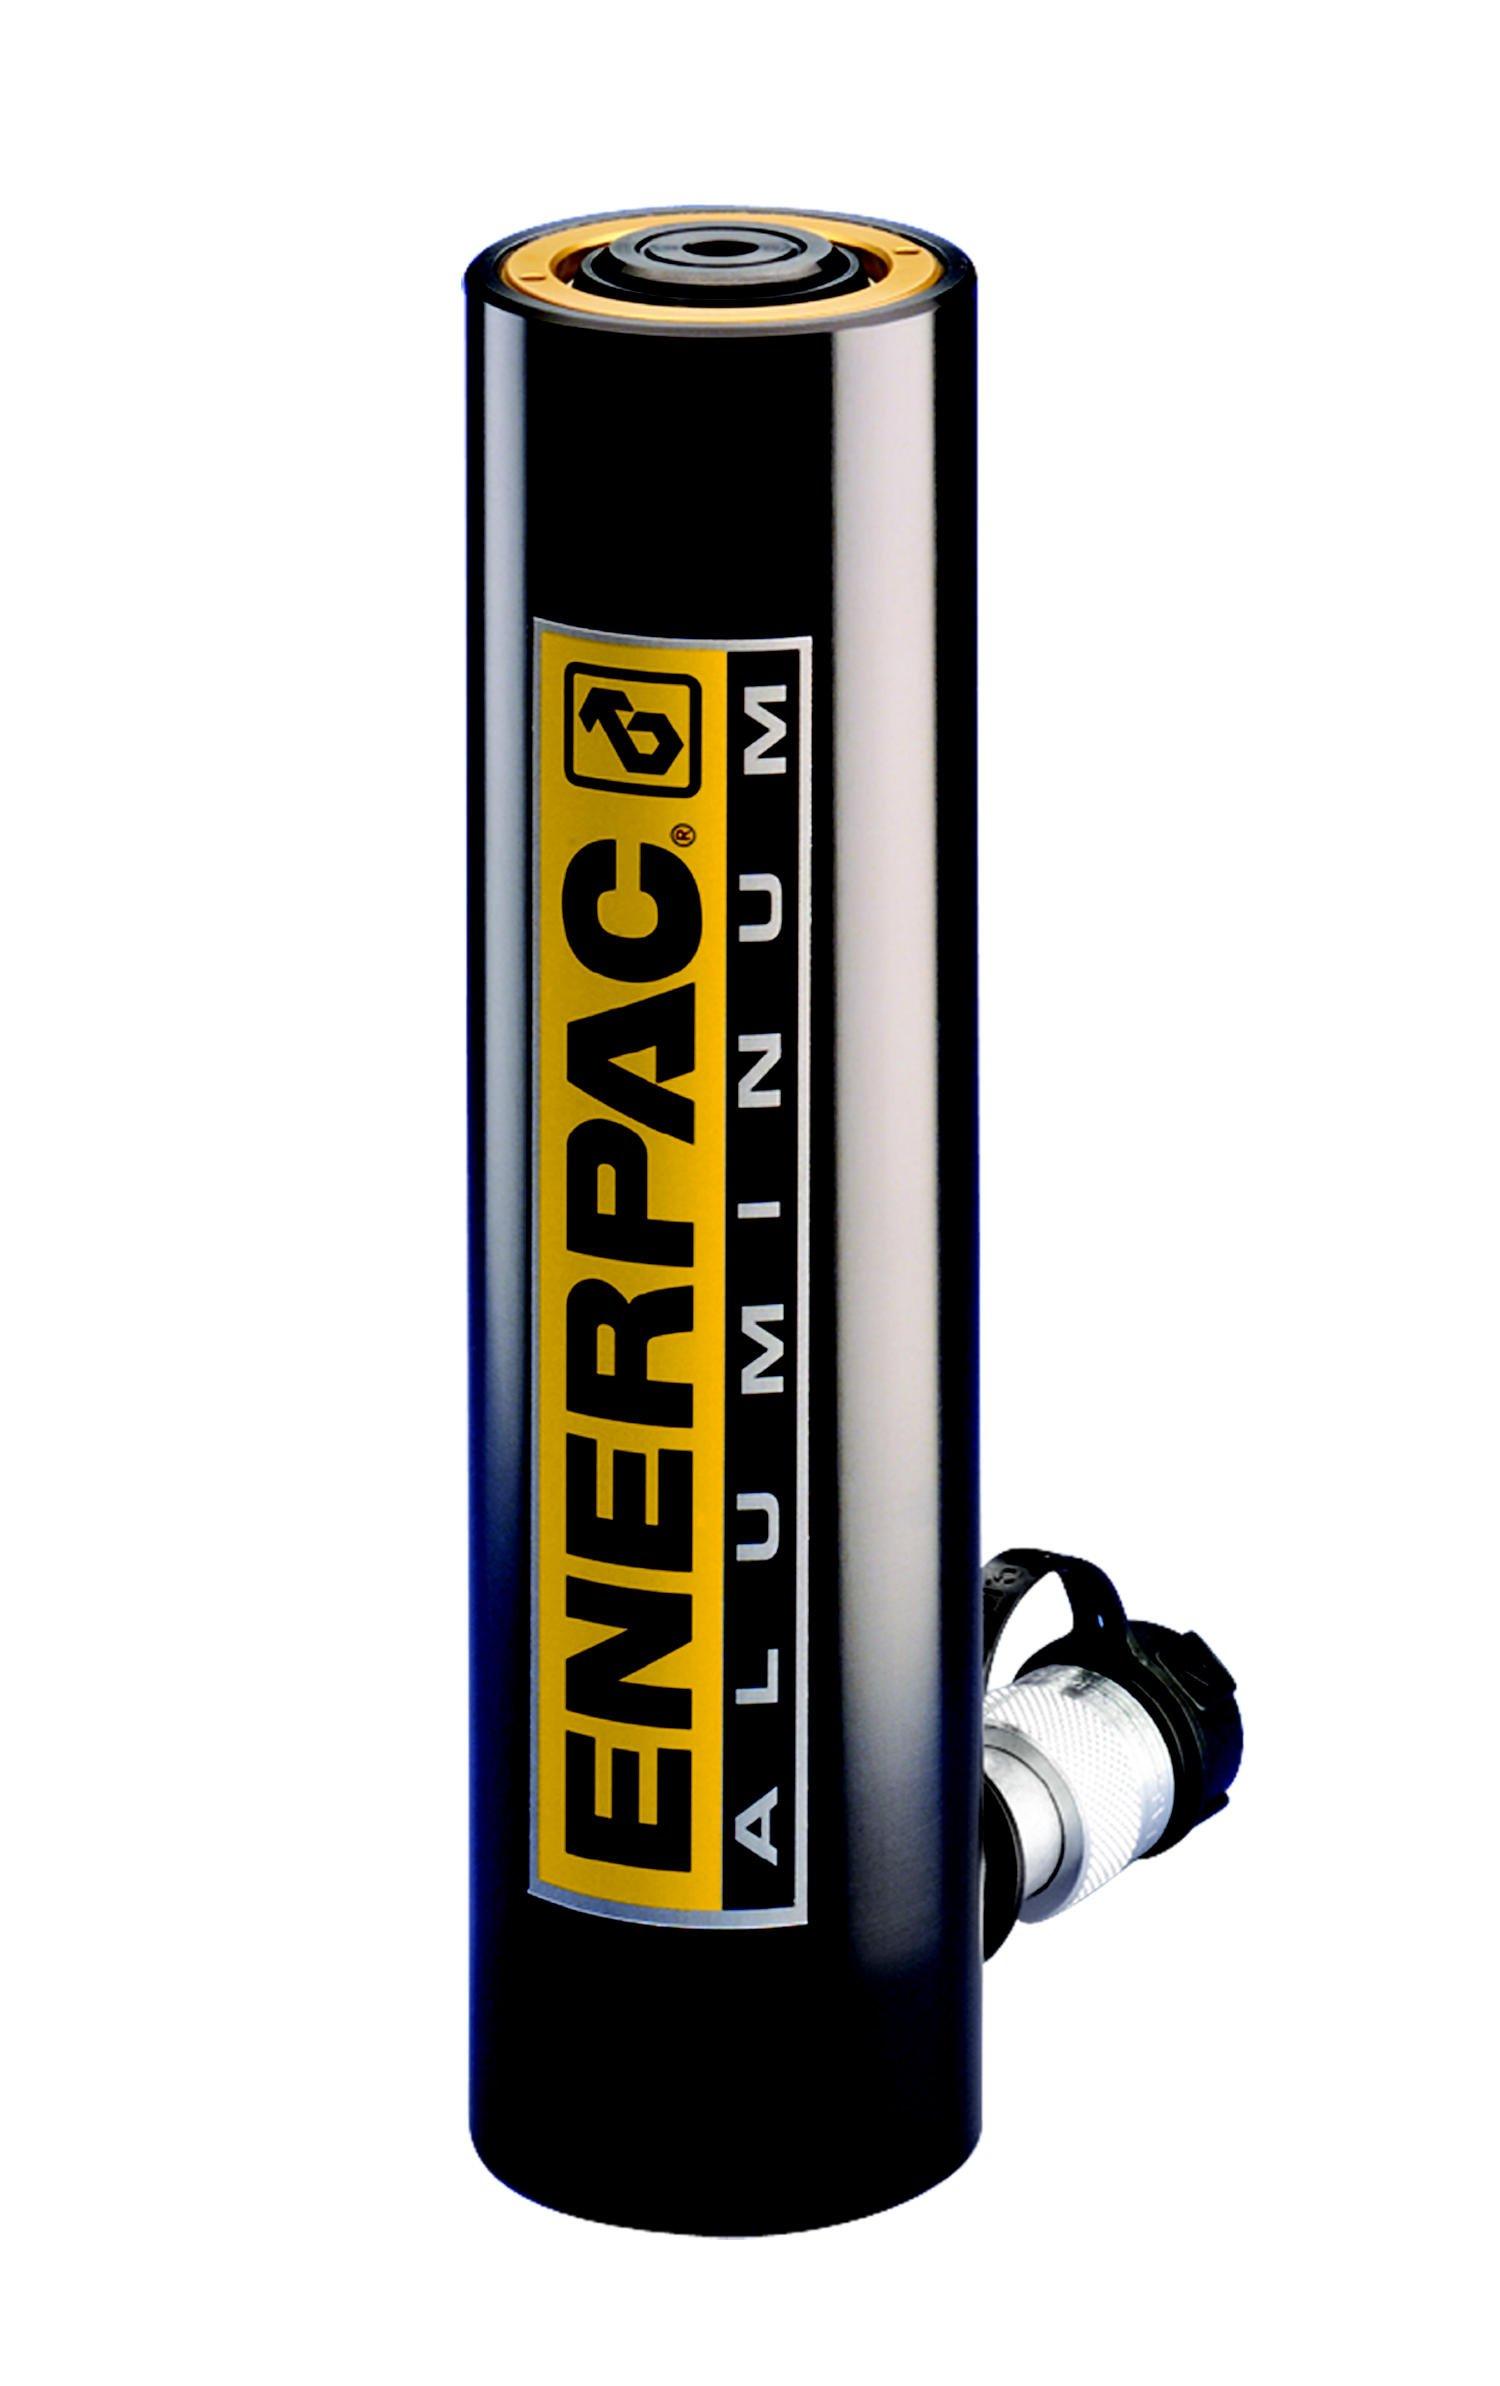 Enerpac RAC-306 Single-Acting Aluminum Hydraulic Cylinder with 30 Ton Capacity, Single Port, 5.91'' Stroke